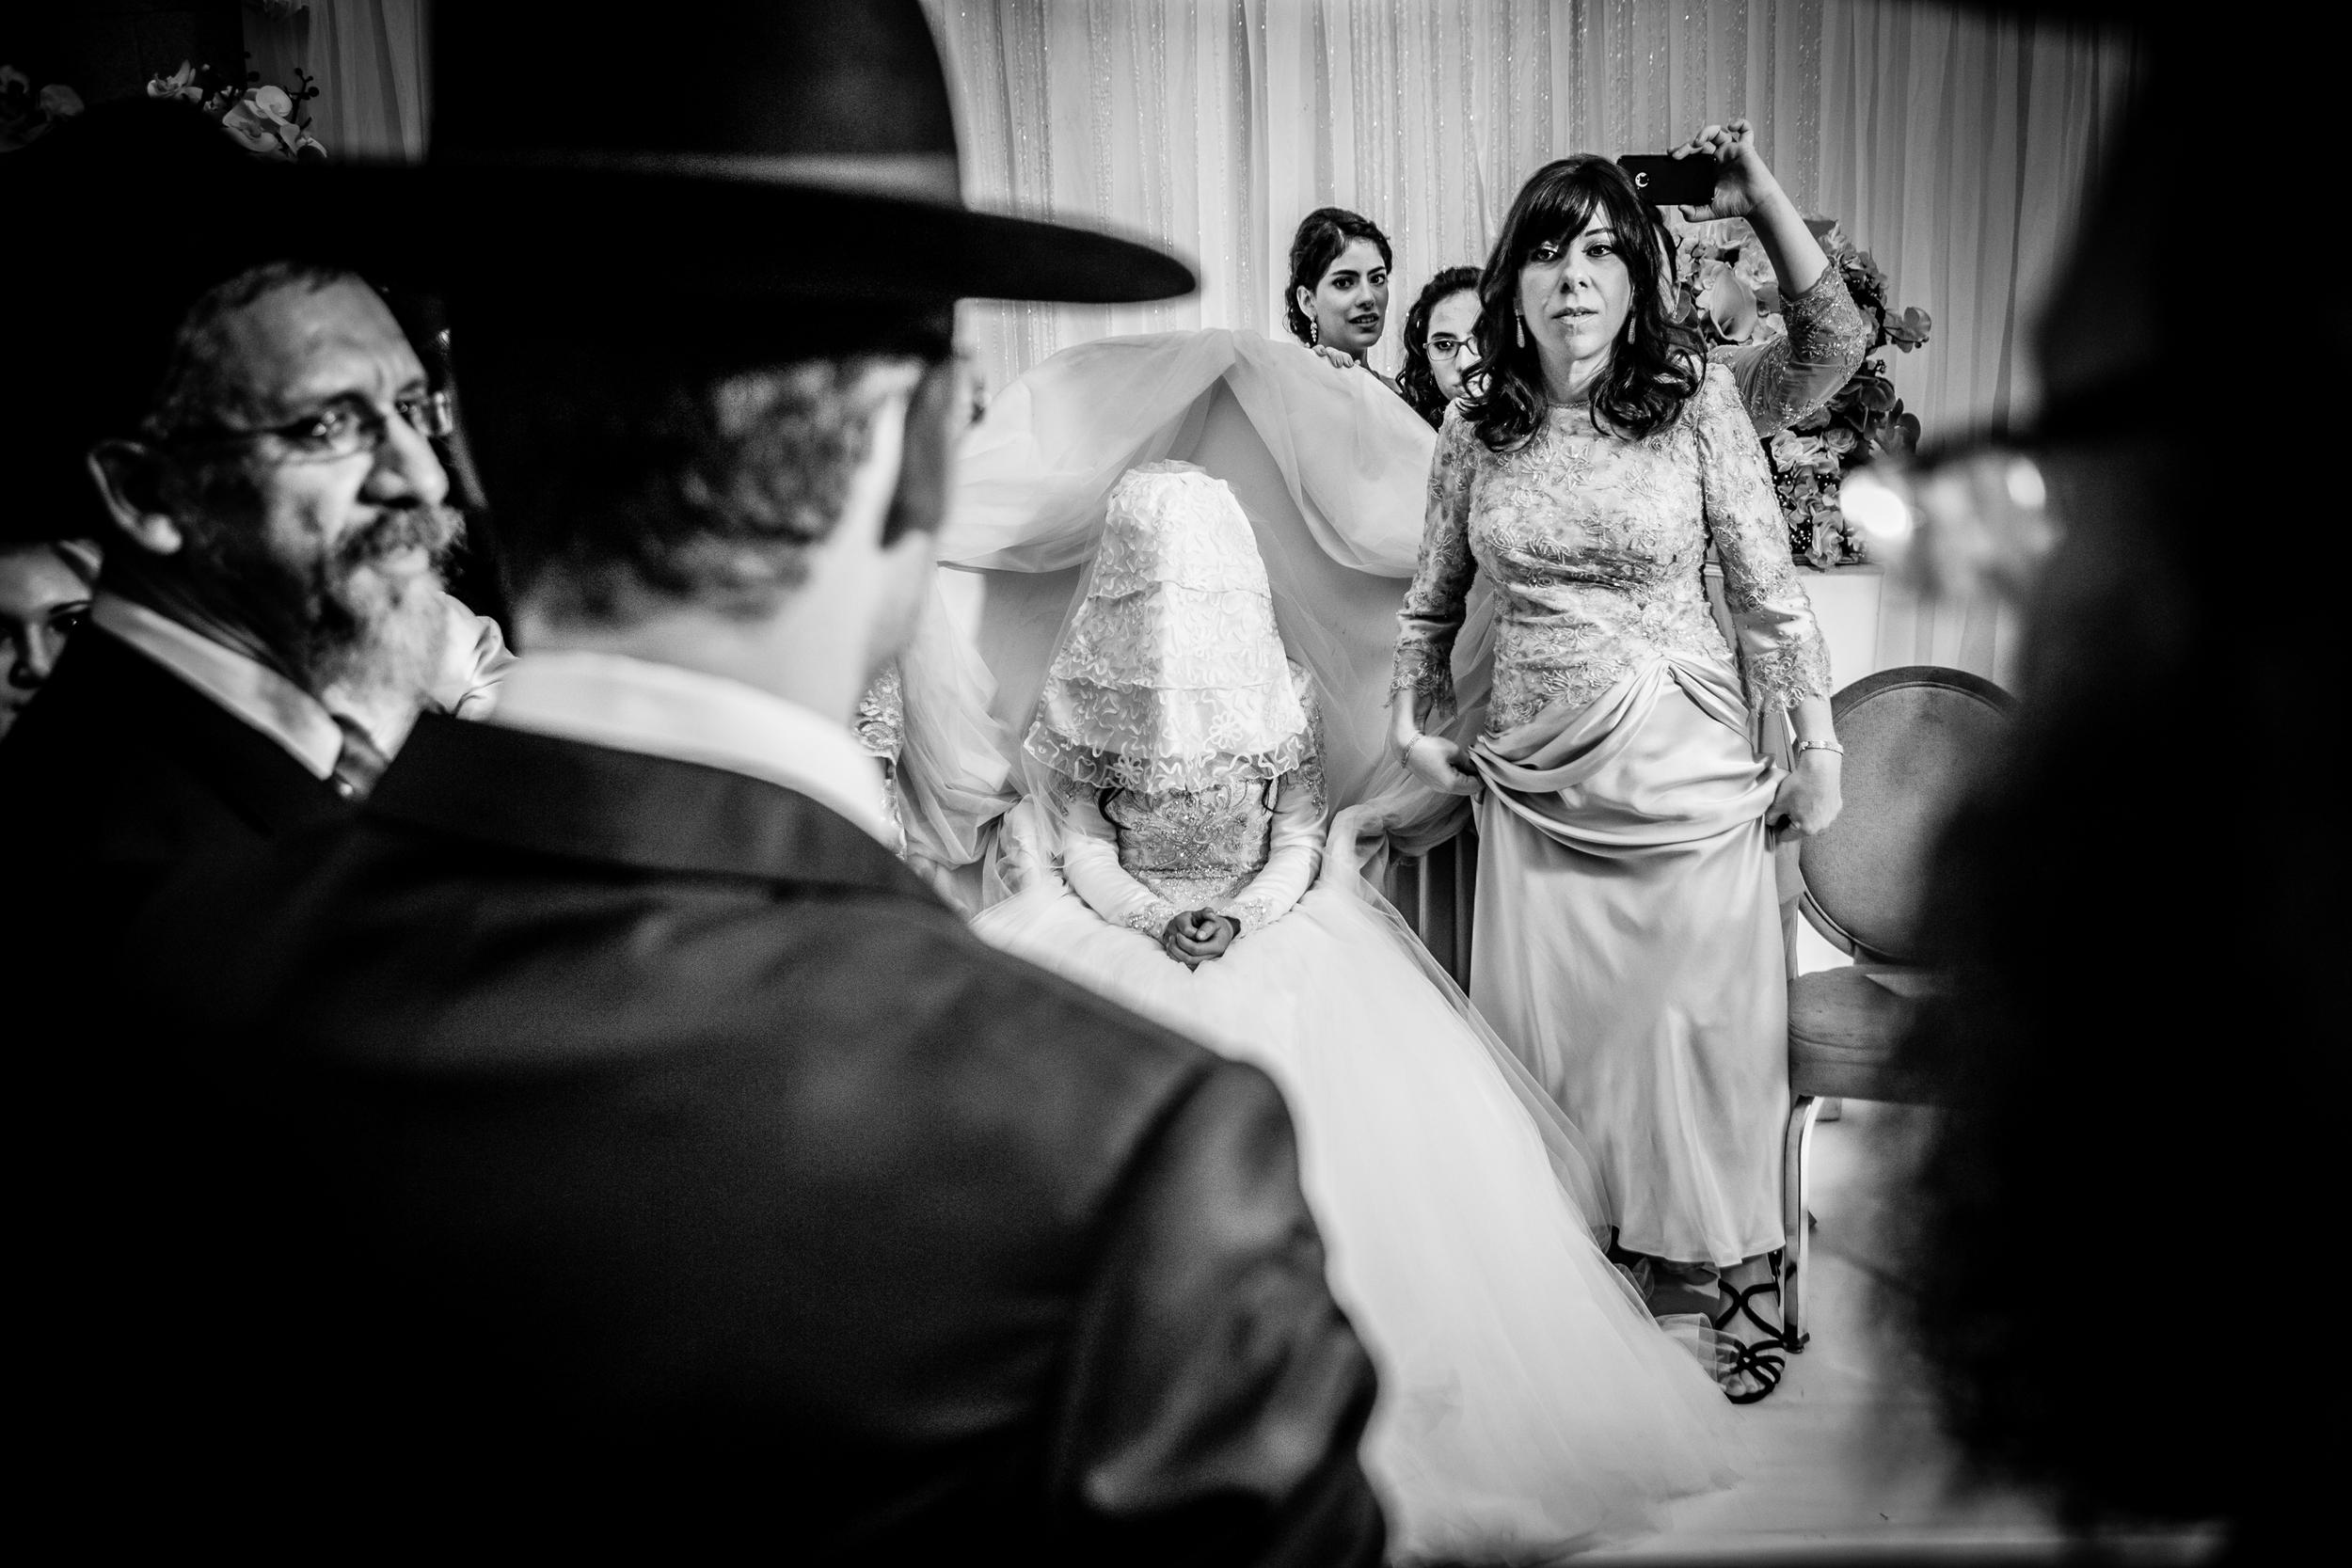 Wedding Iossi and Gitty Khafif  - Eliau Piha studio photography, new york, events, people 770 brooklyn -0339.jpg